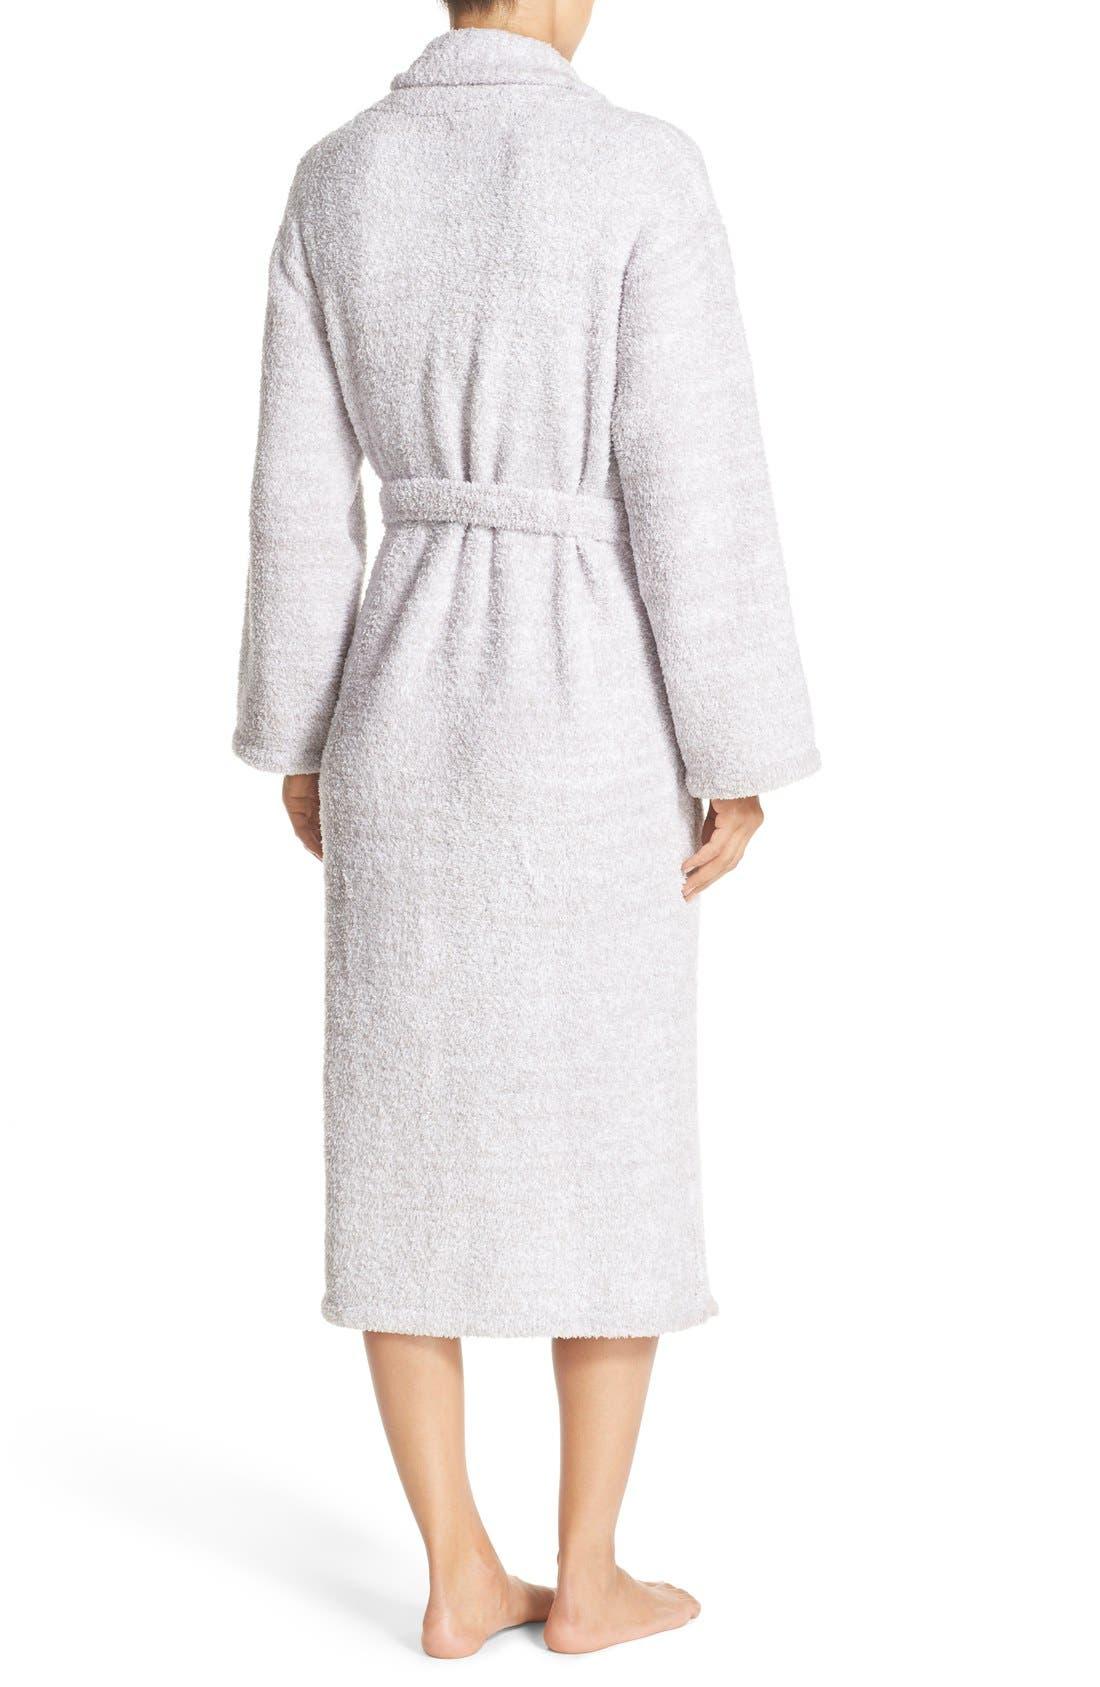 cafepress unisex pajama novelty set pj comforter sleepwear cotton clothing amazon dp sanders com comfortable pajamas bernie